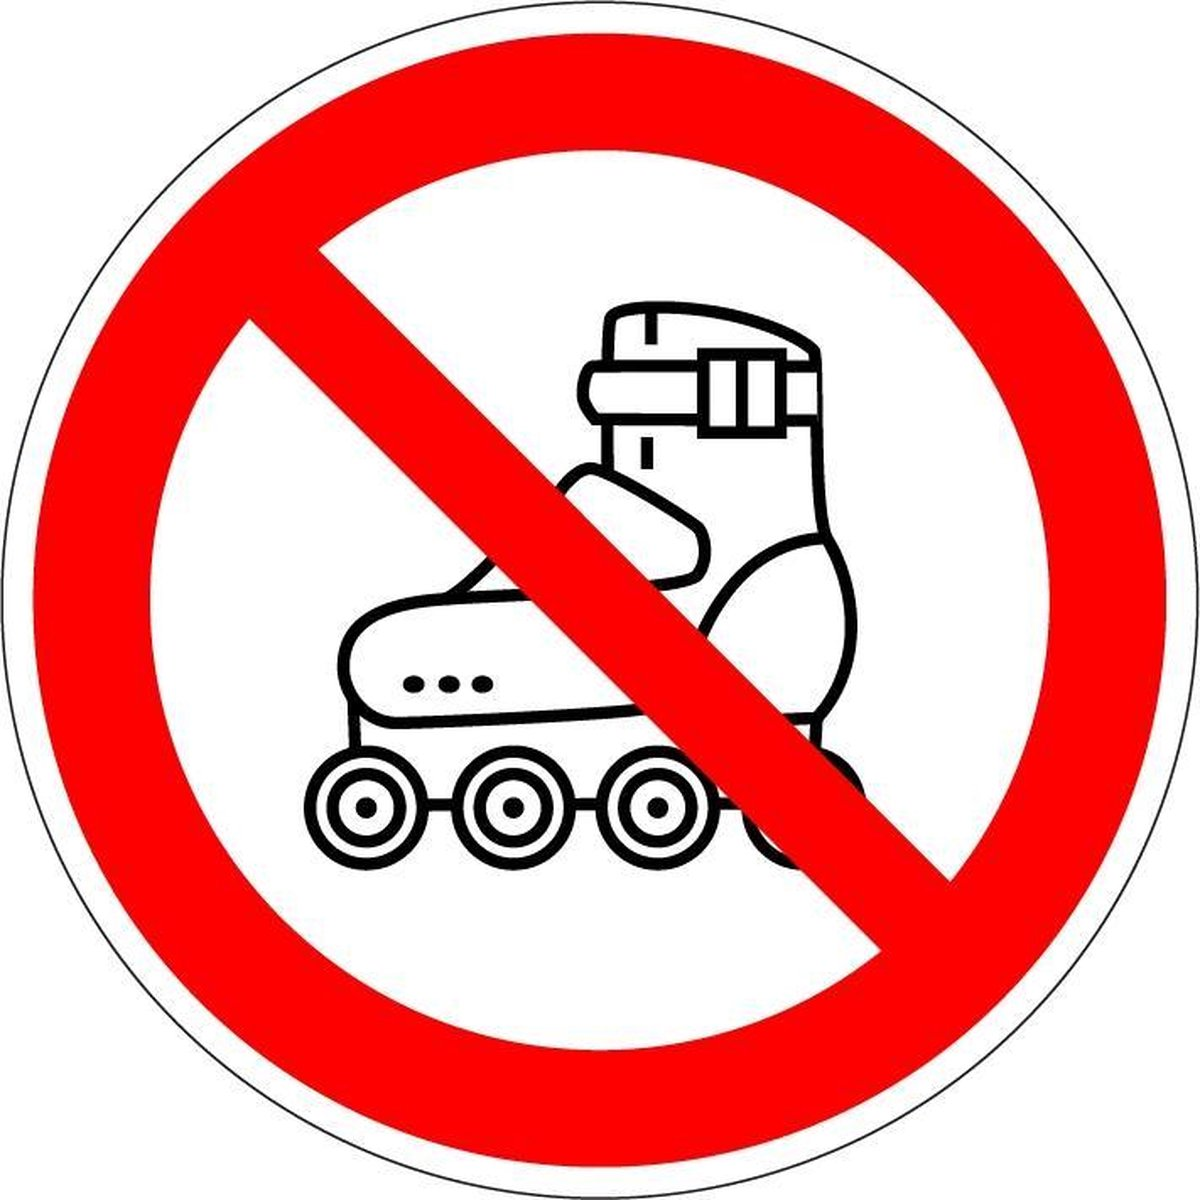 Verboden te skaten sticker 100 mm